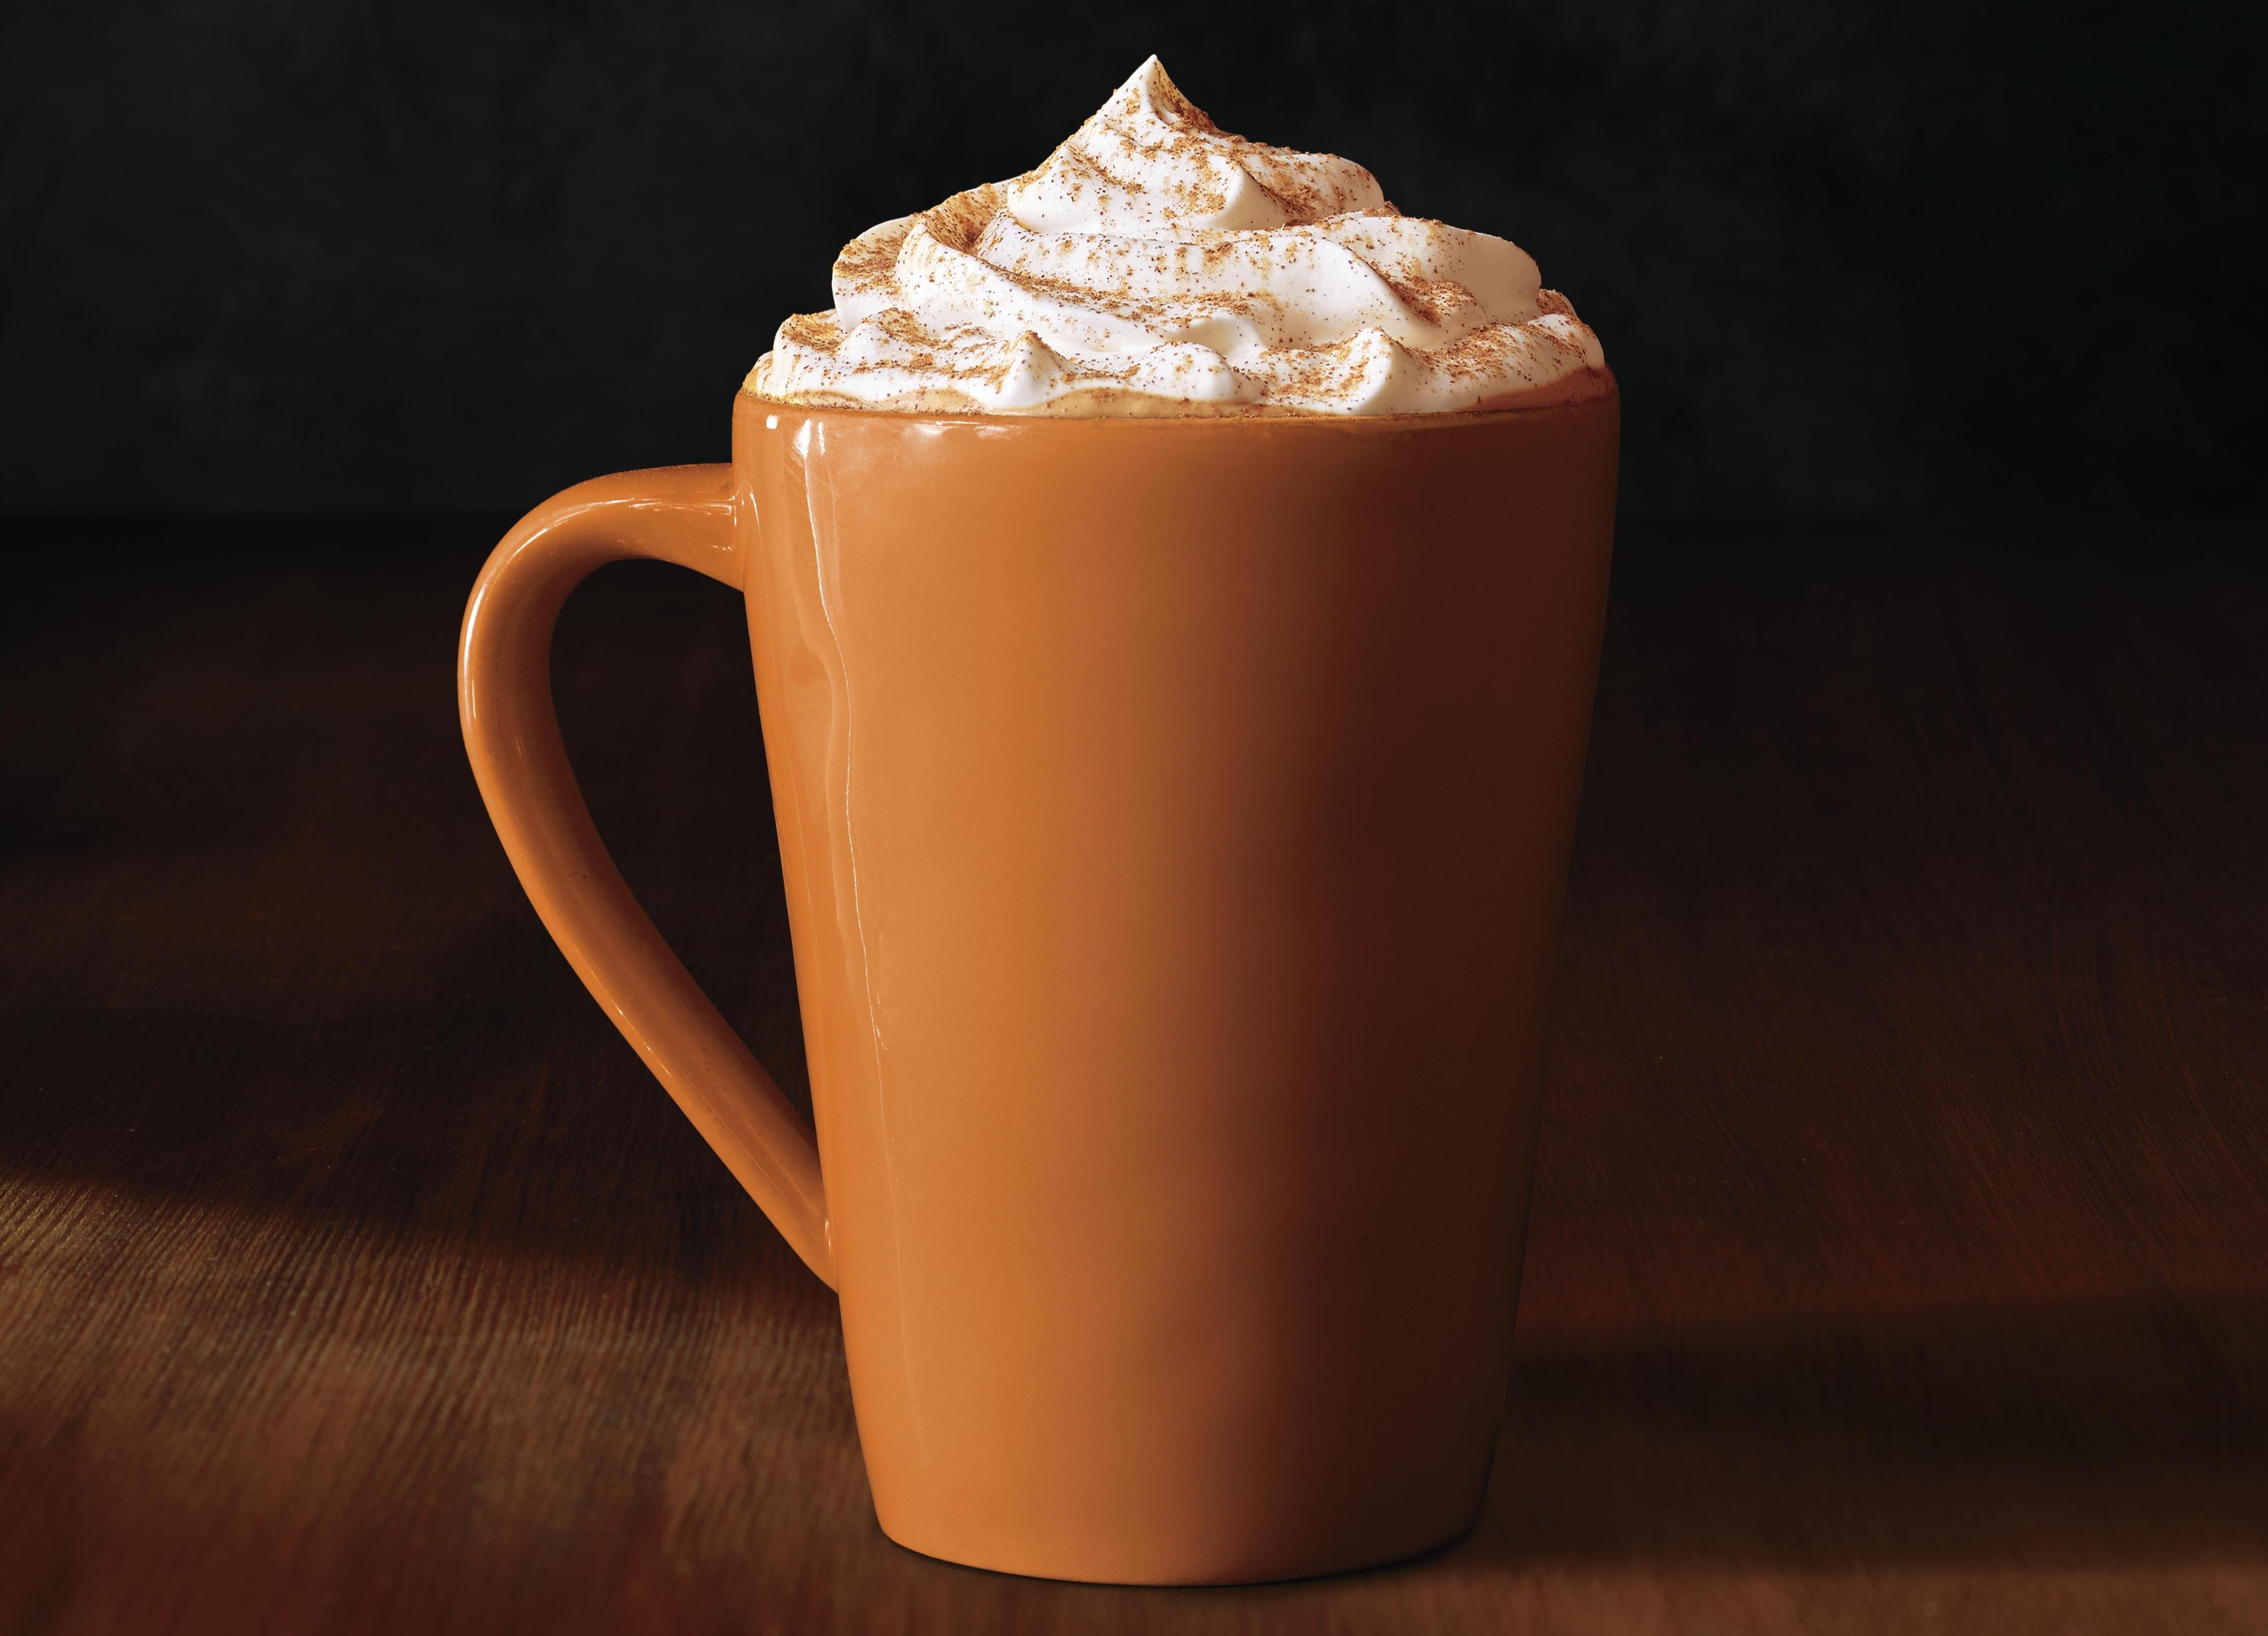 The pumpkin spice latte returns to Starbucks starting Tuesday.